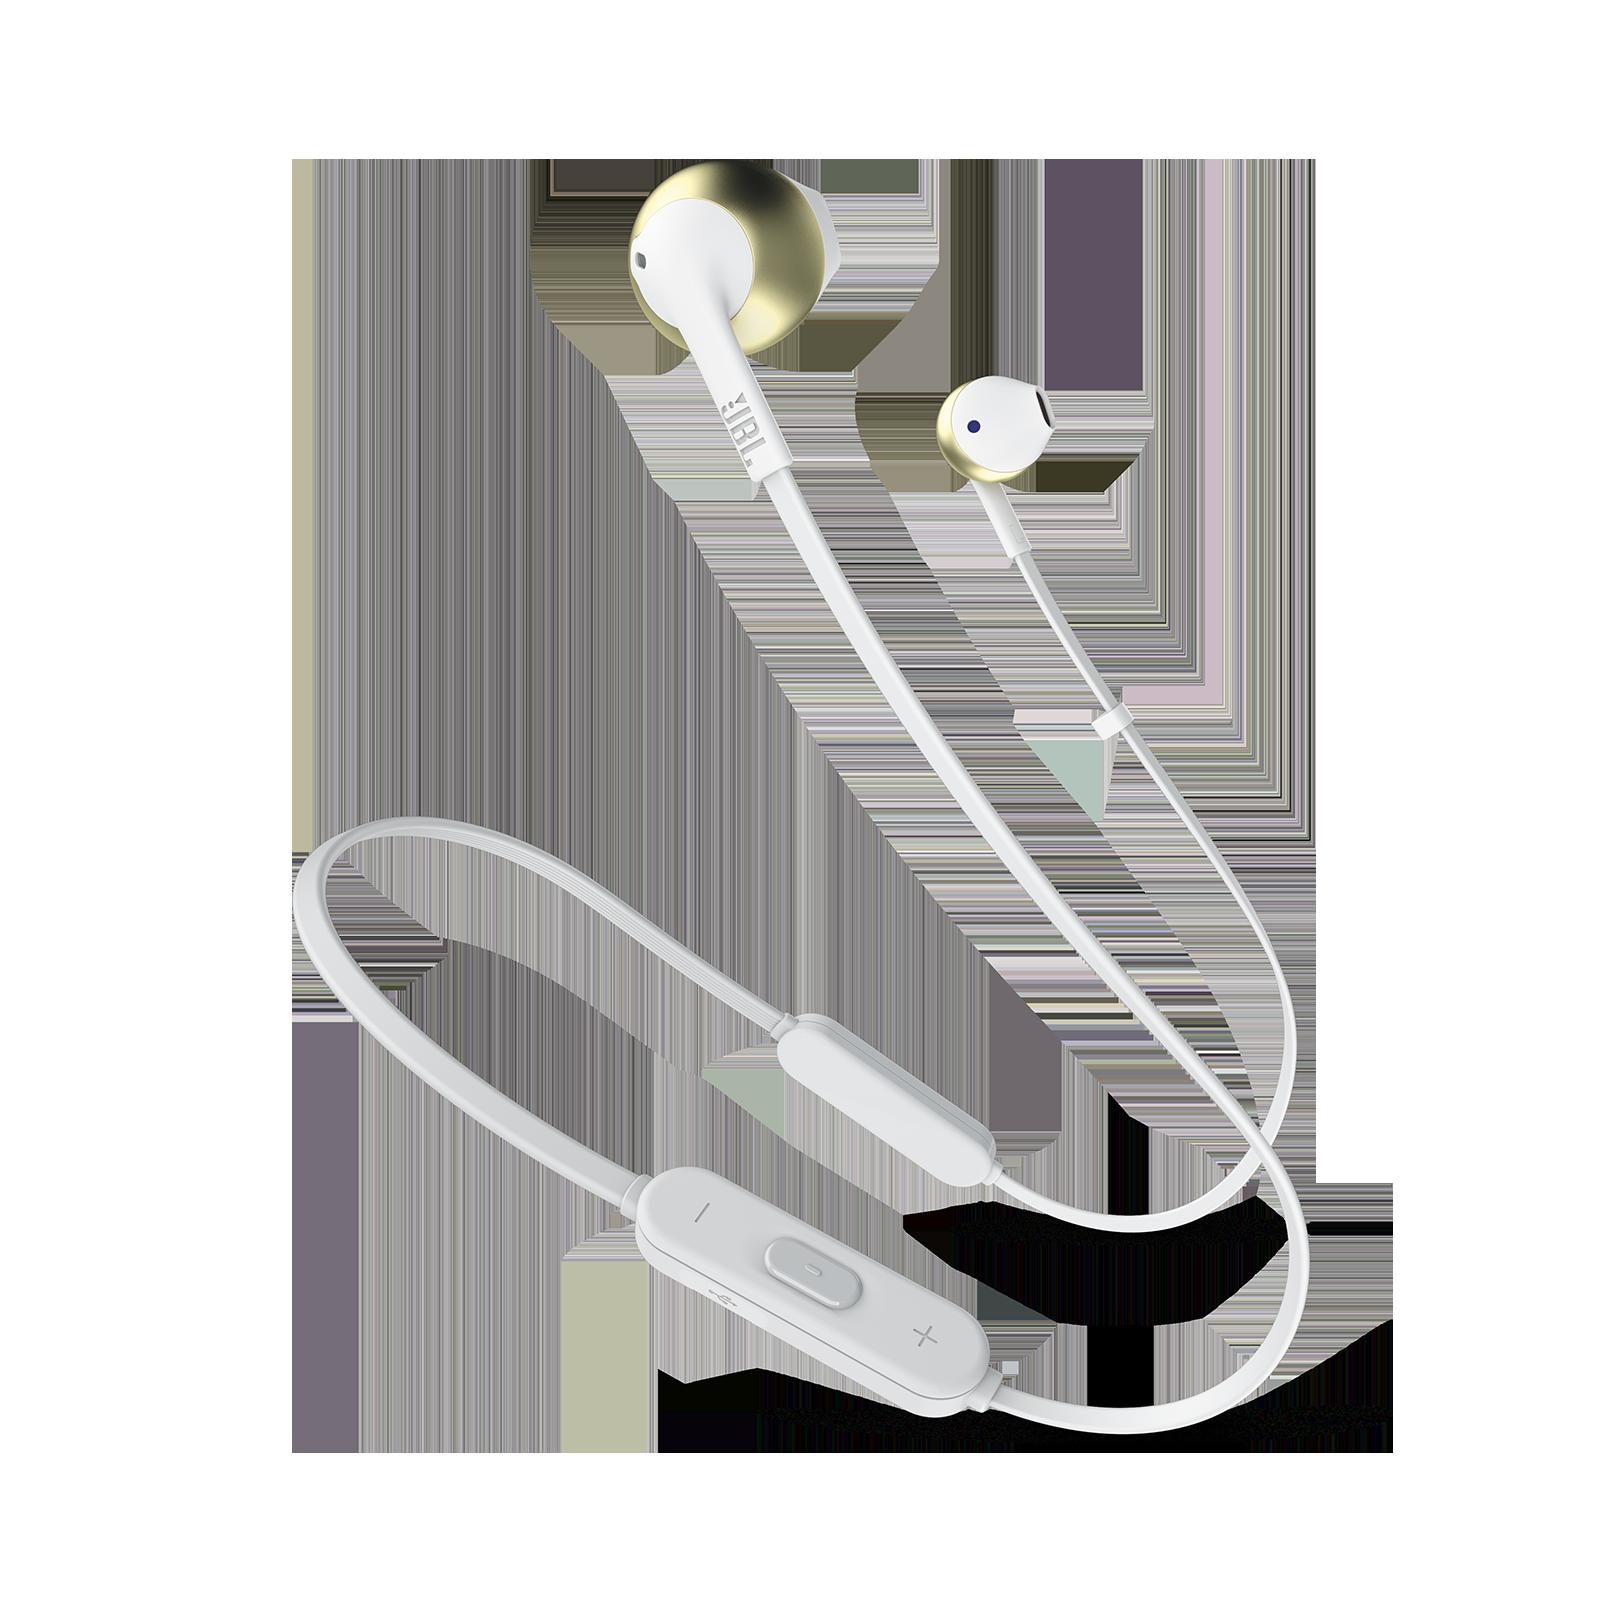 JBL TUNE 205BT - Champagne Gold - Wireless Earbud headphones - Hero